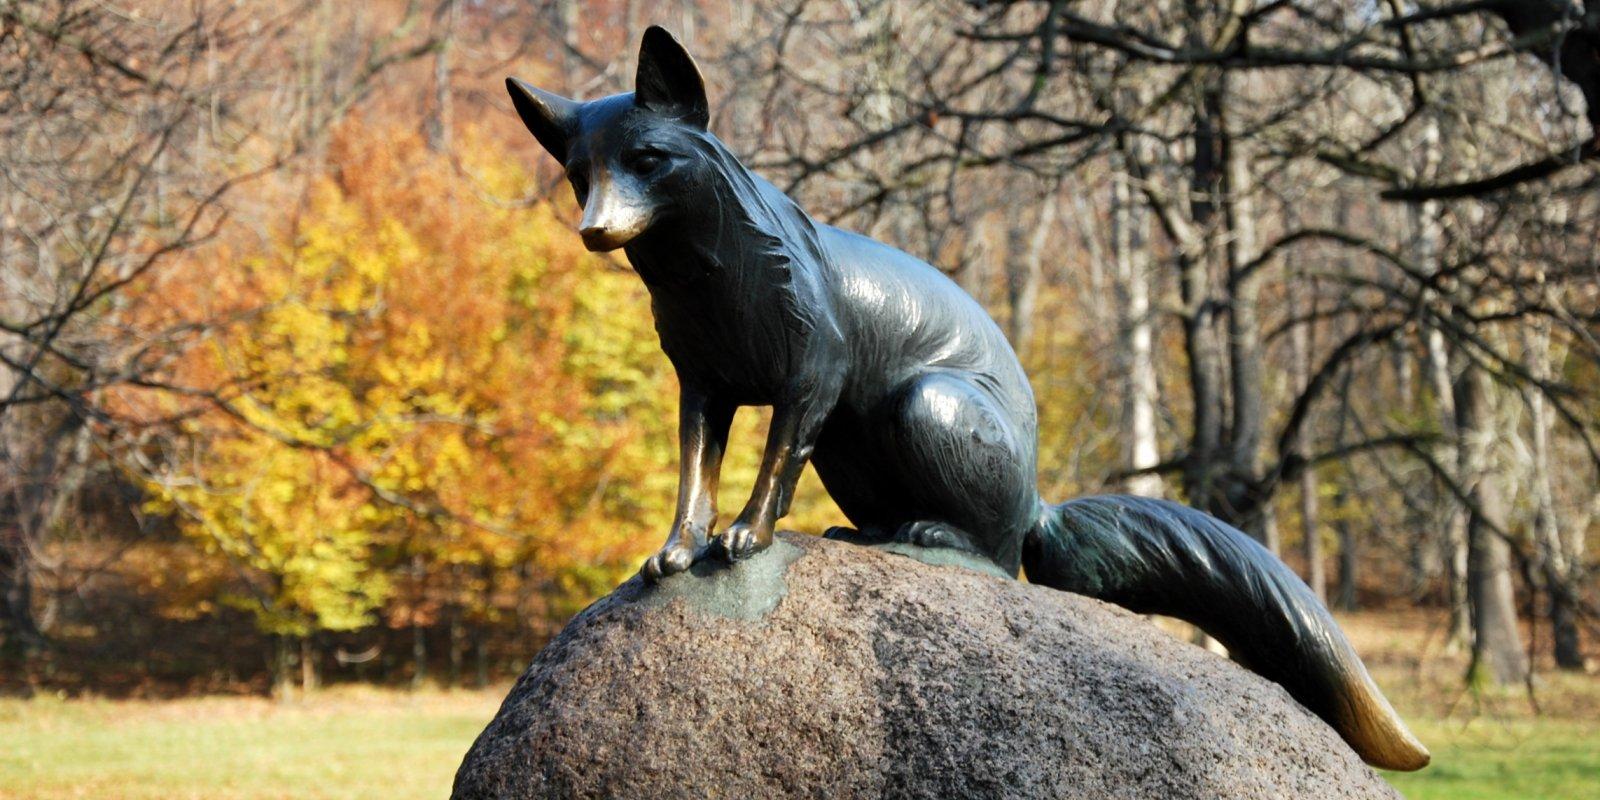 Socha lišky na Hukvaldech © ThinkstockPhotos